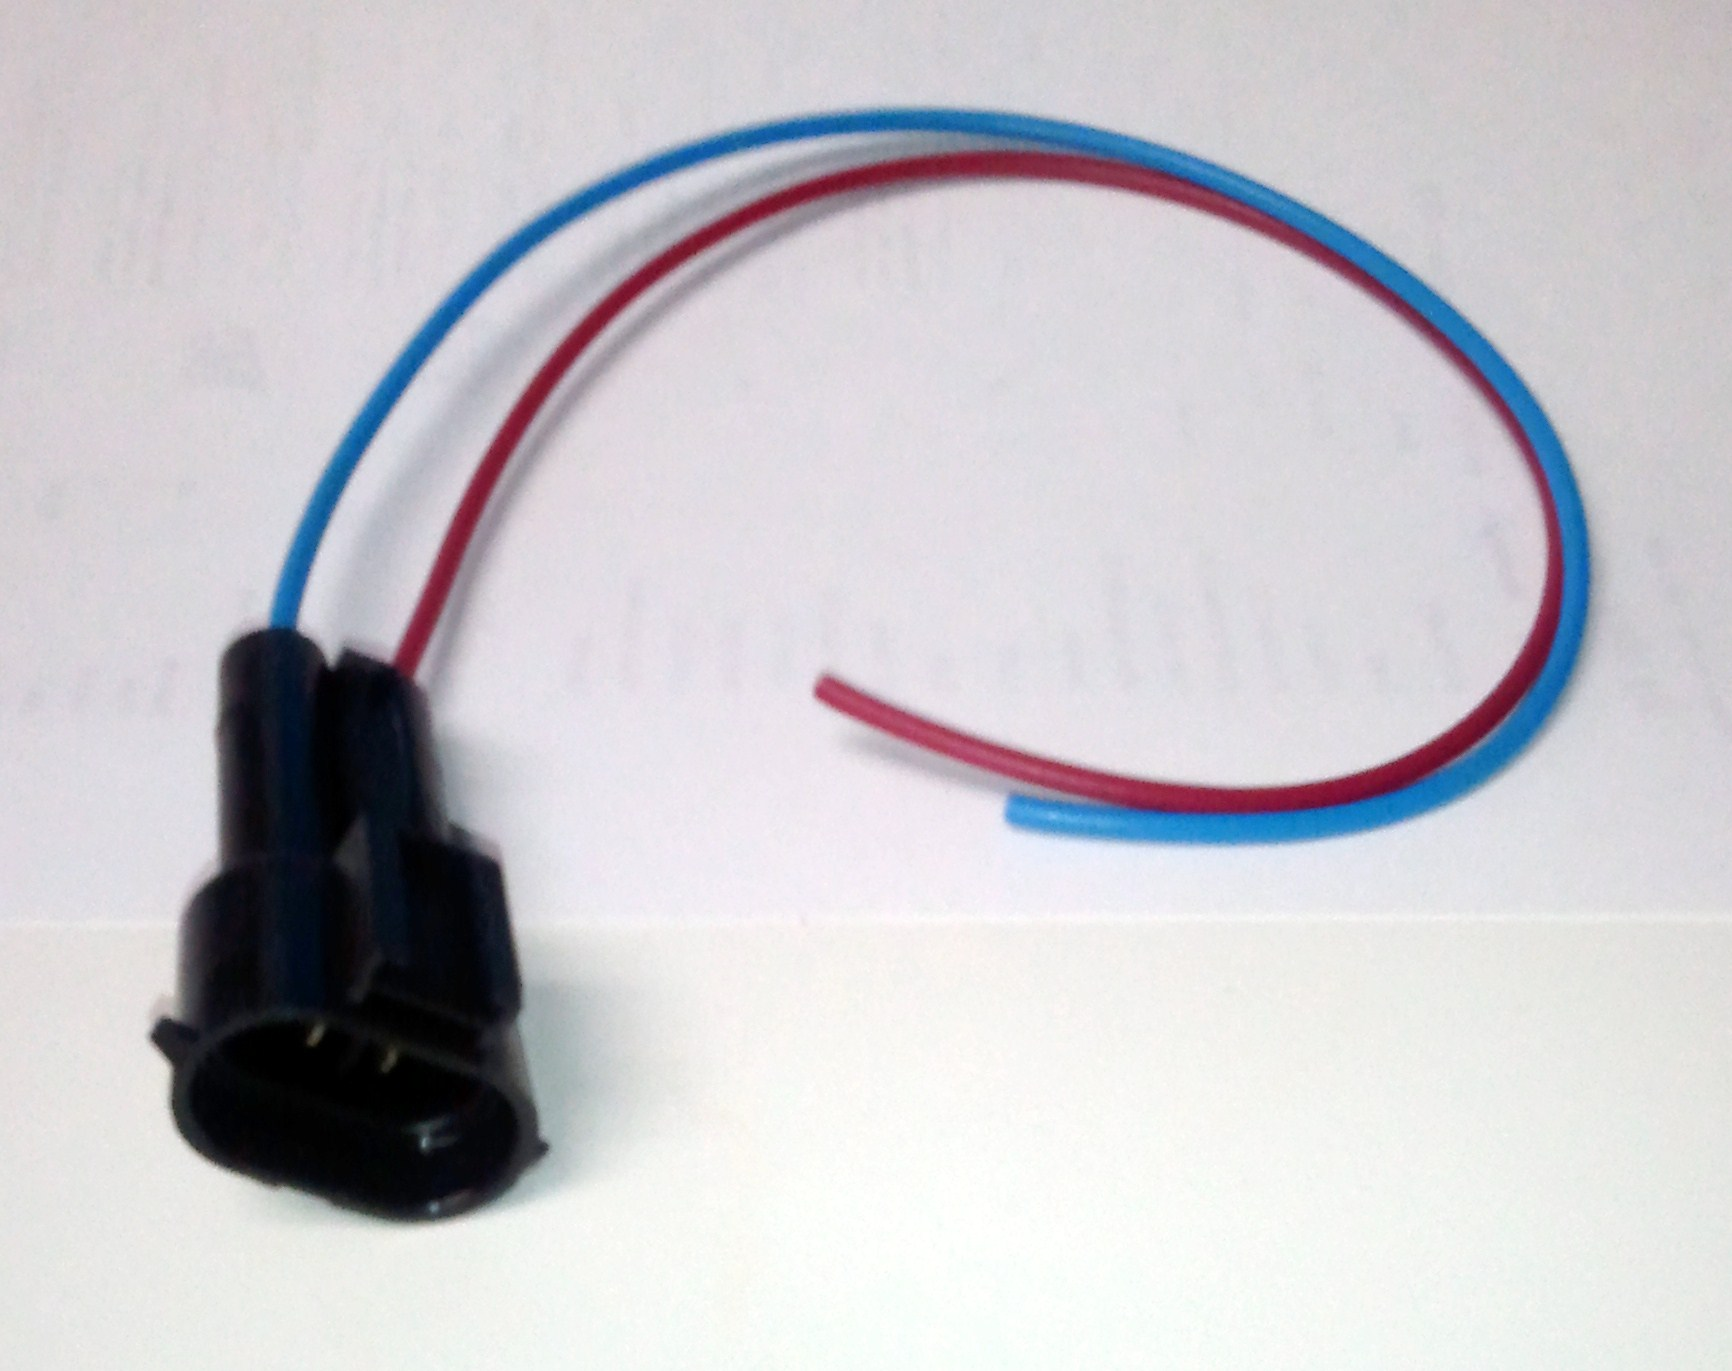 h11 h9 h8 wire harness connector hid xenon ebay